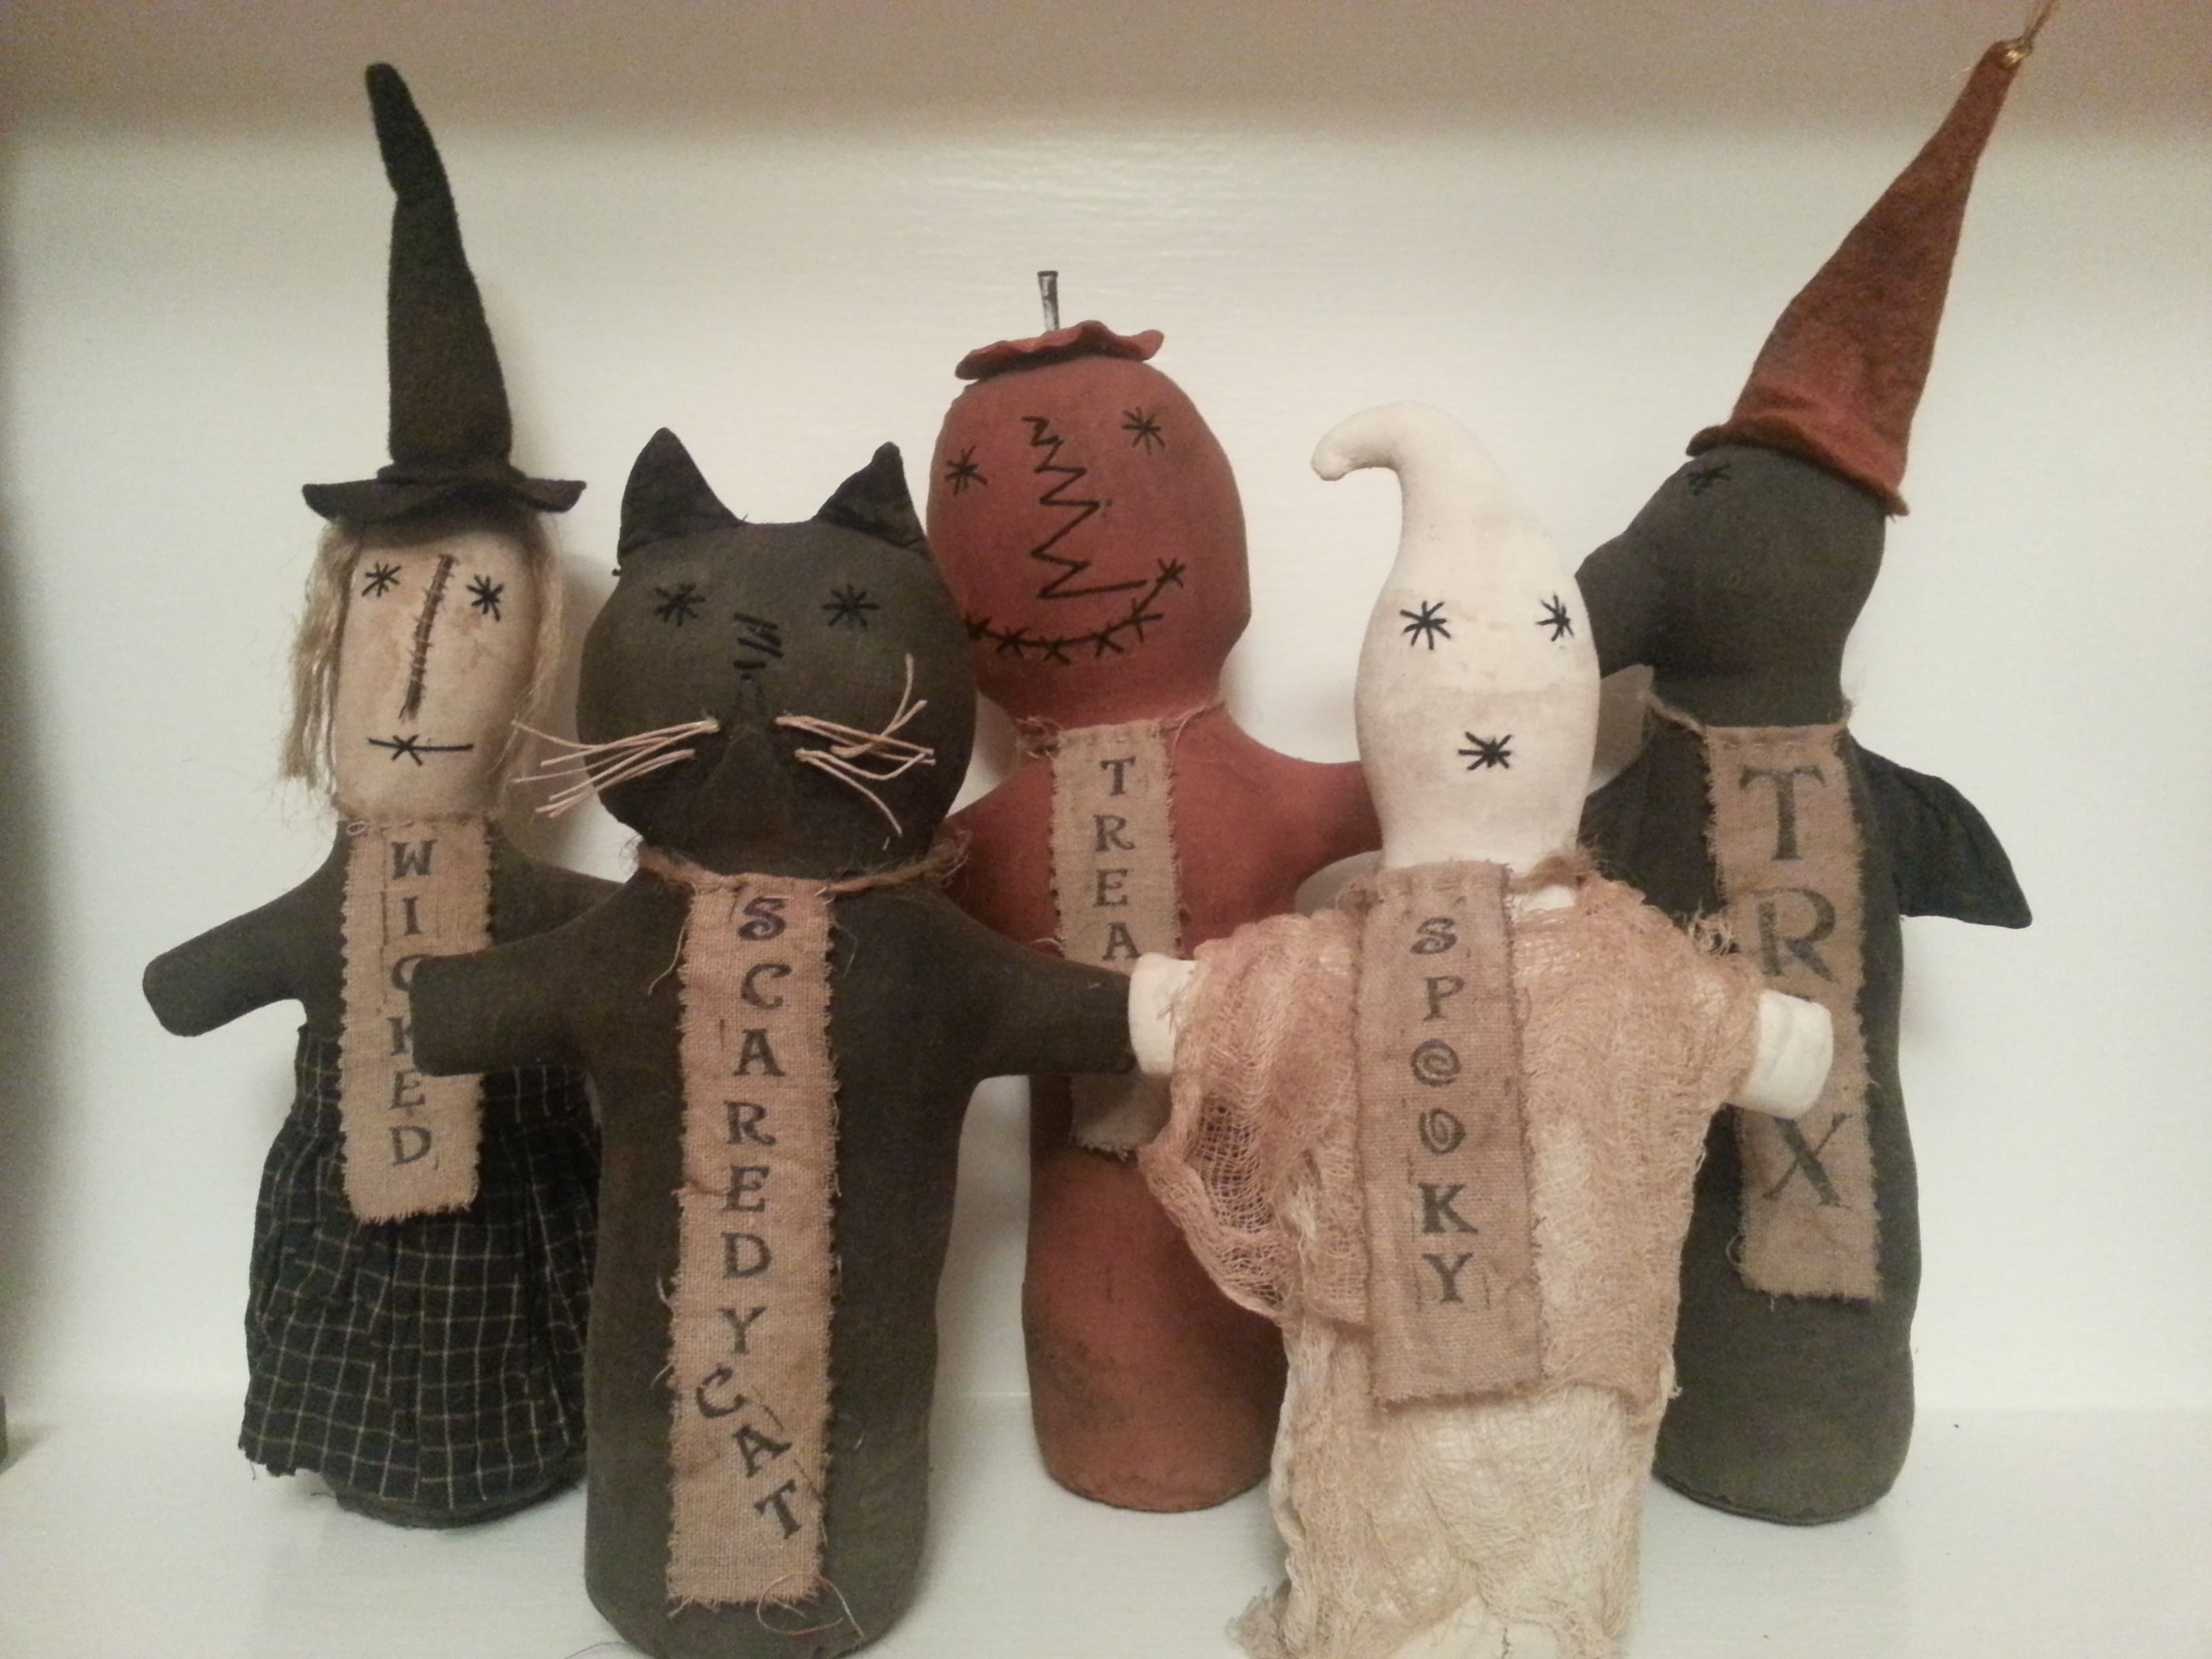 Primitive decorations from Butternut Creek Folk Art at